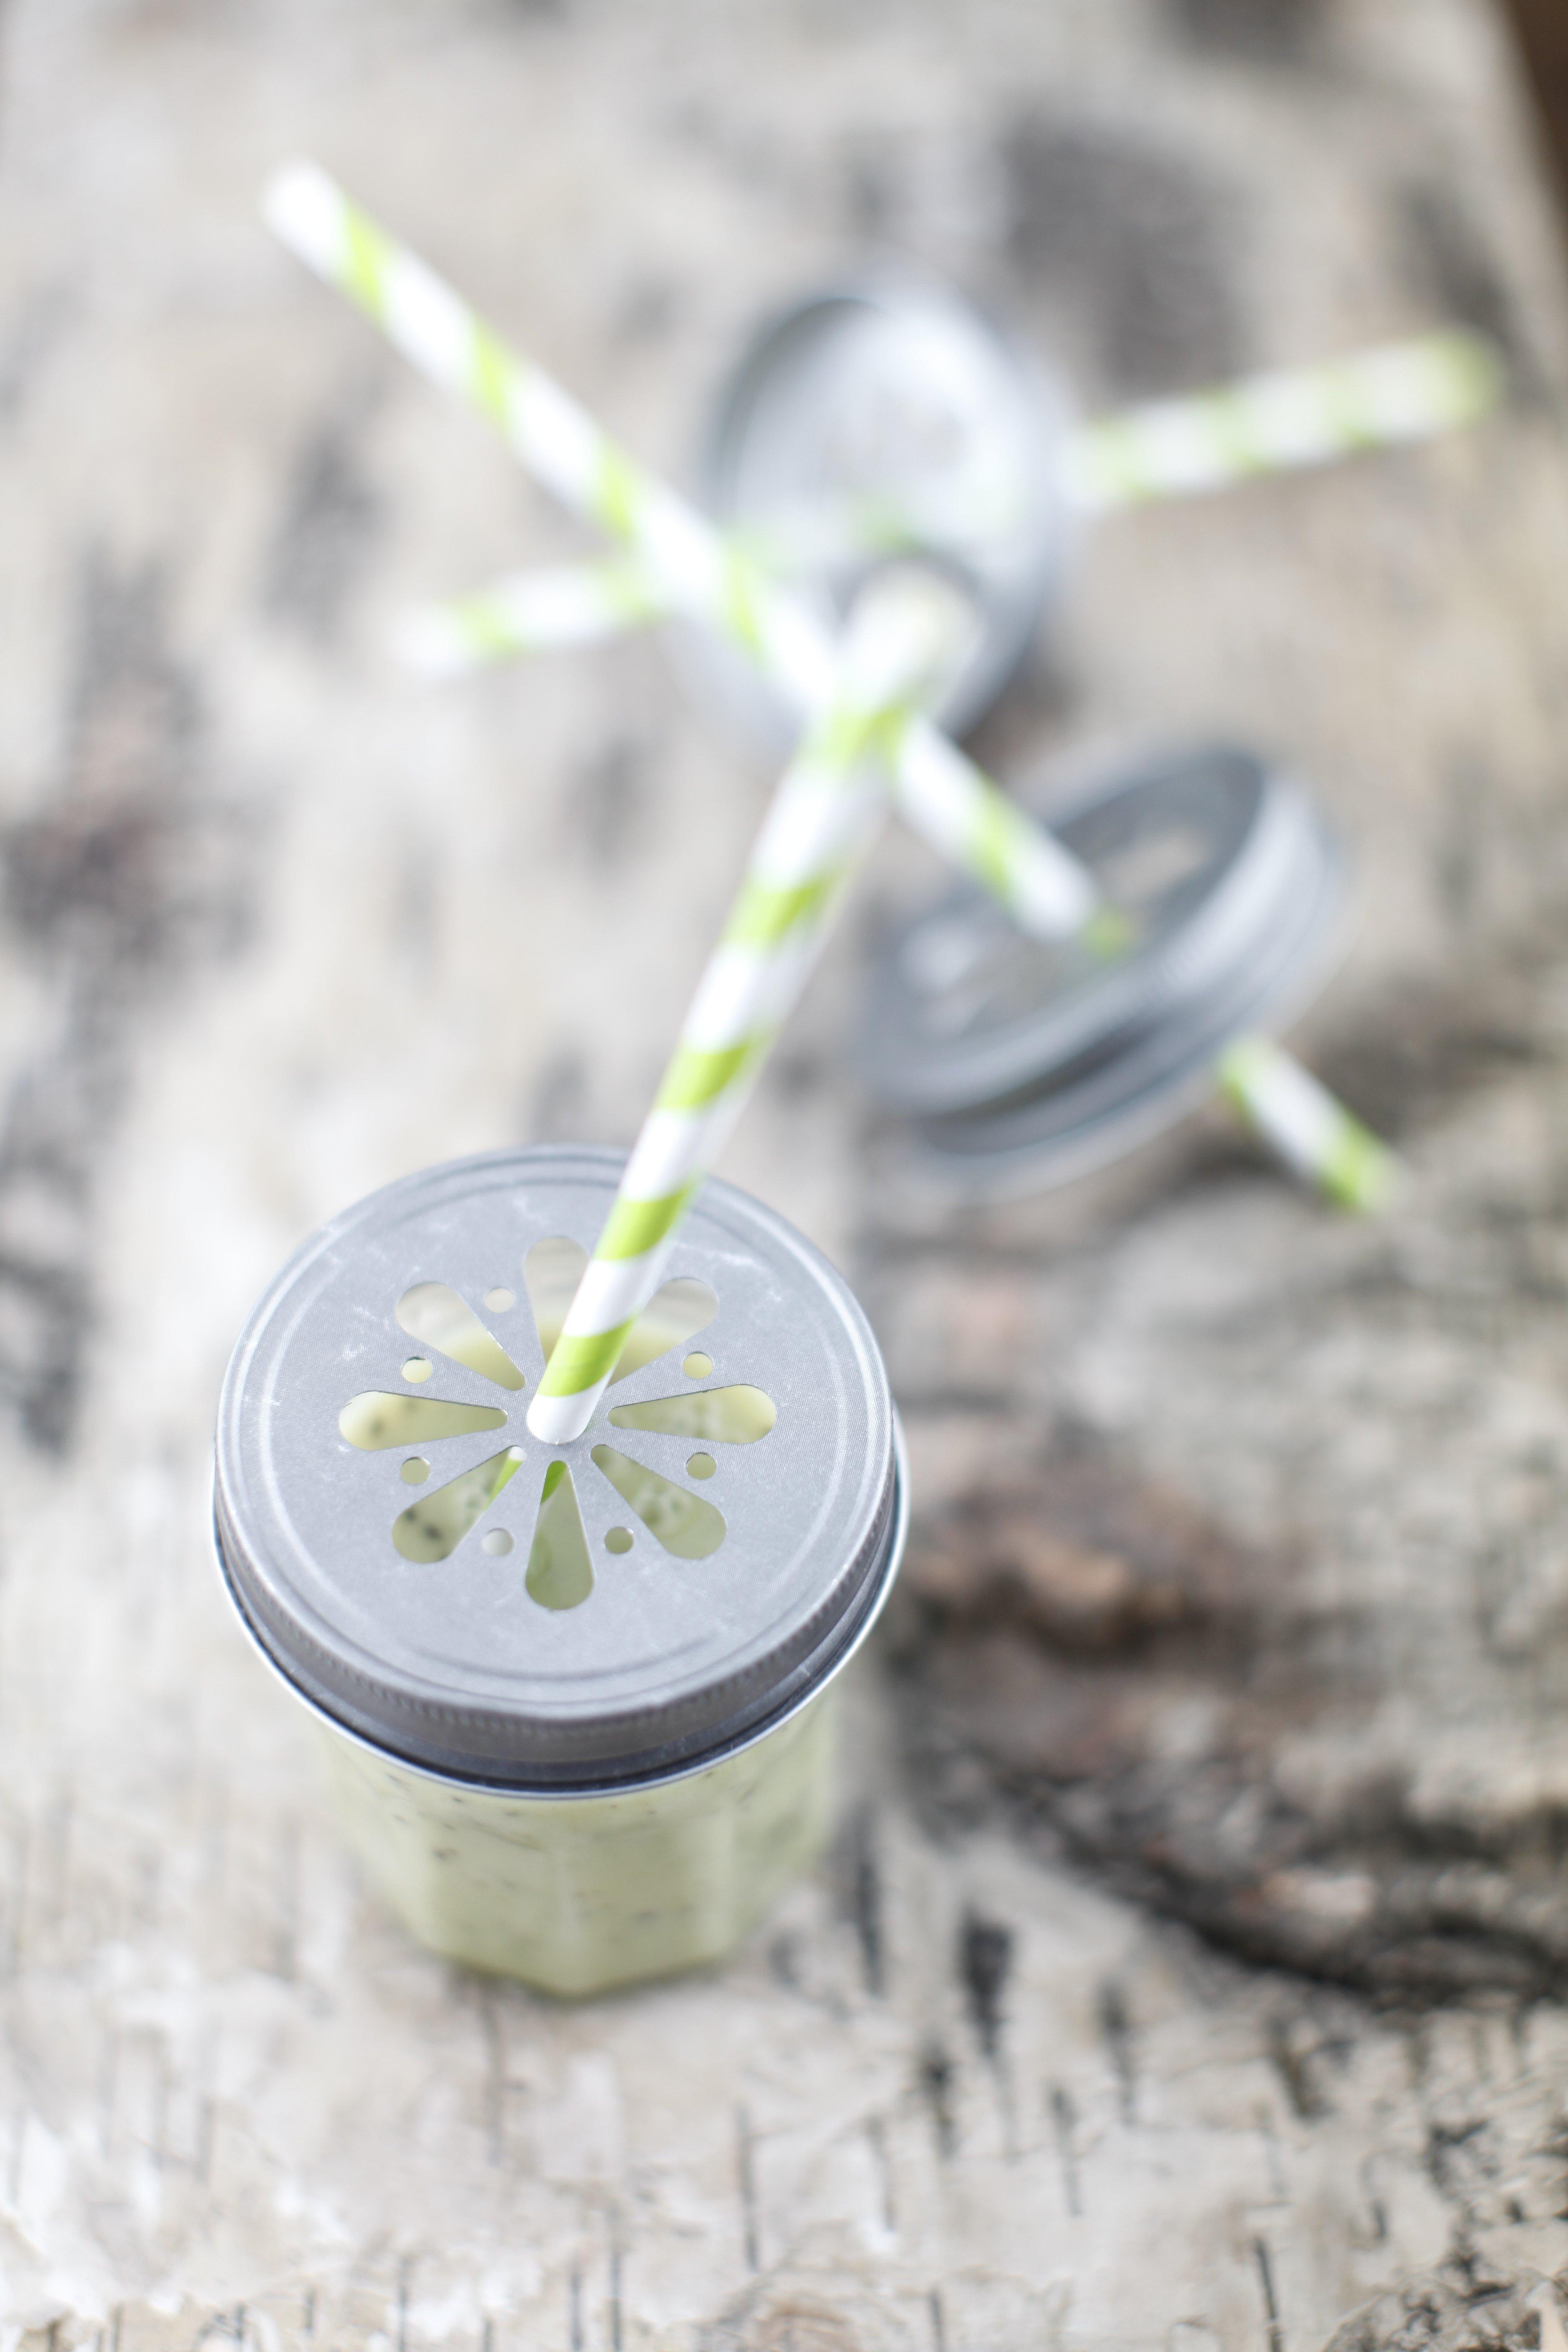 pici-e-castagne-smoothie-al-kiwi-3